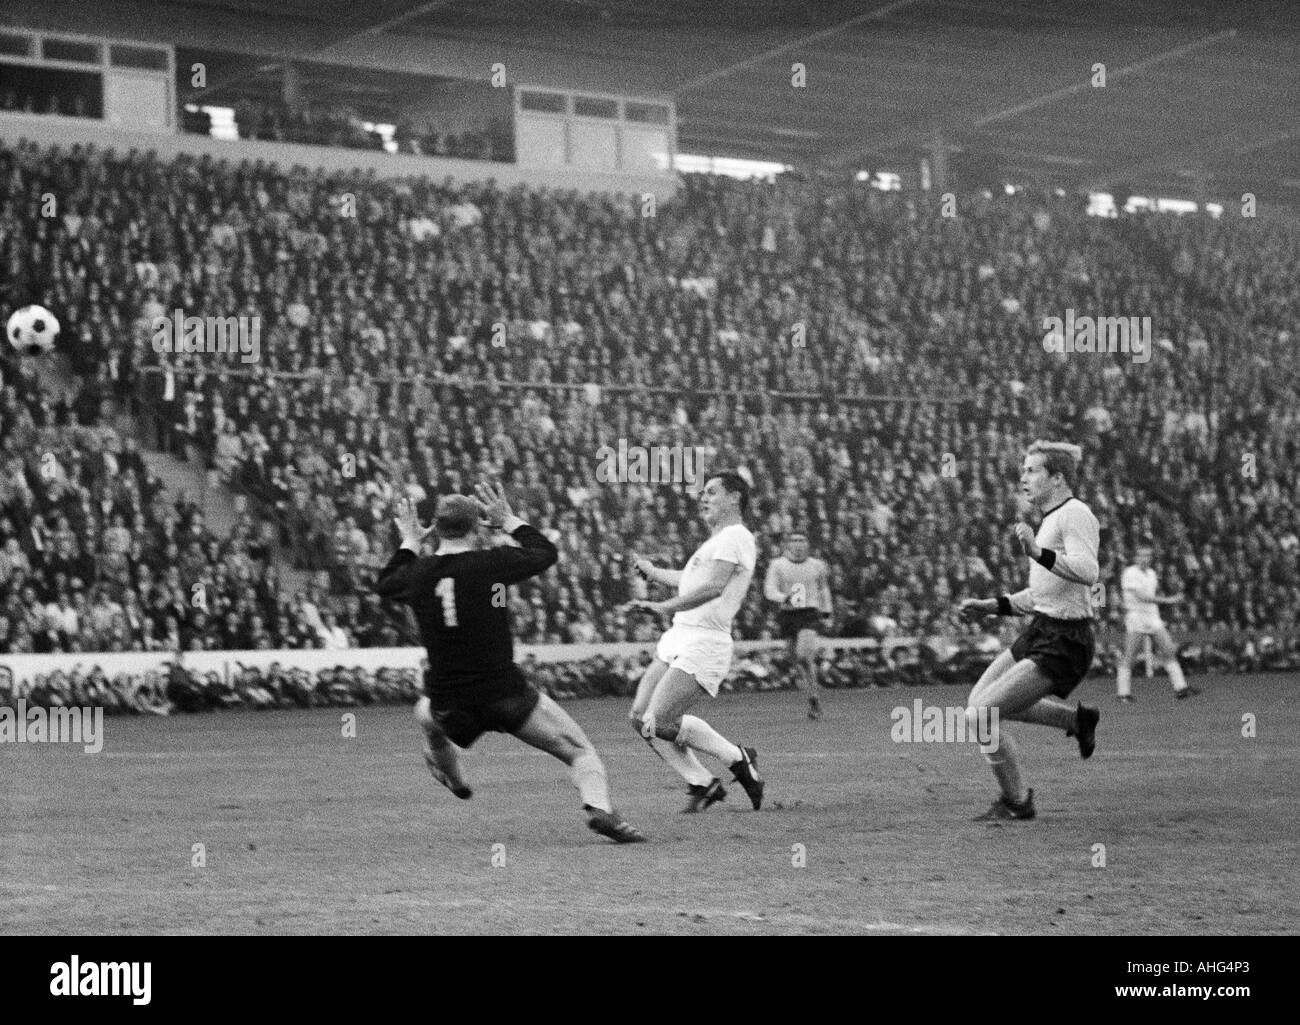 football, Bundesliga, 1967/1968, Borussia Moenchengladbach versus Borussia Dortmund 2:2, Boekelberg Stadium, scene of the match, f.l.t.r. keeper Bernhard Wessel (BVB), Peter Meyer (Gladbach), Theodor Redder (BVB) - Stock Image